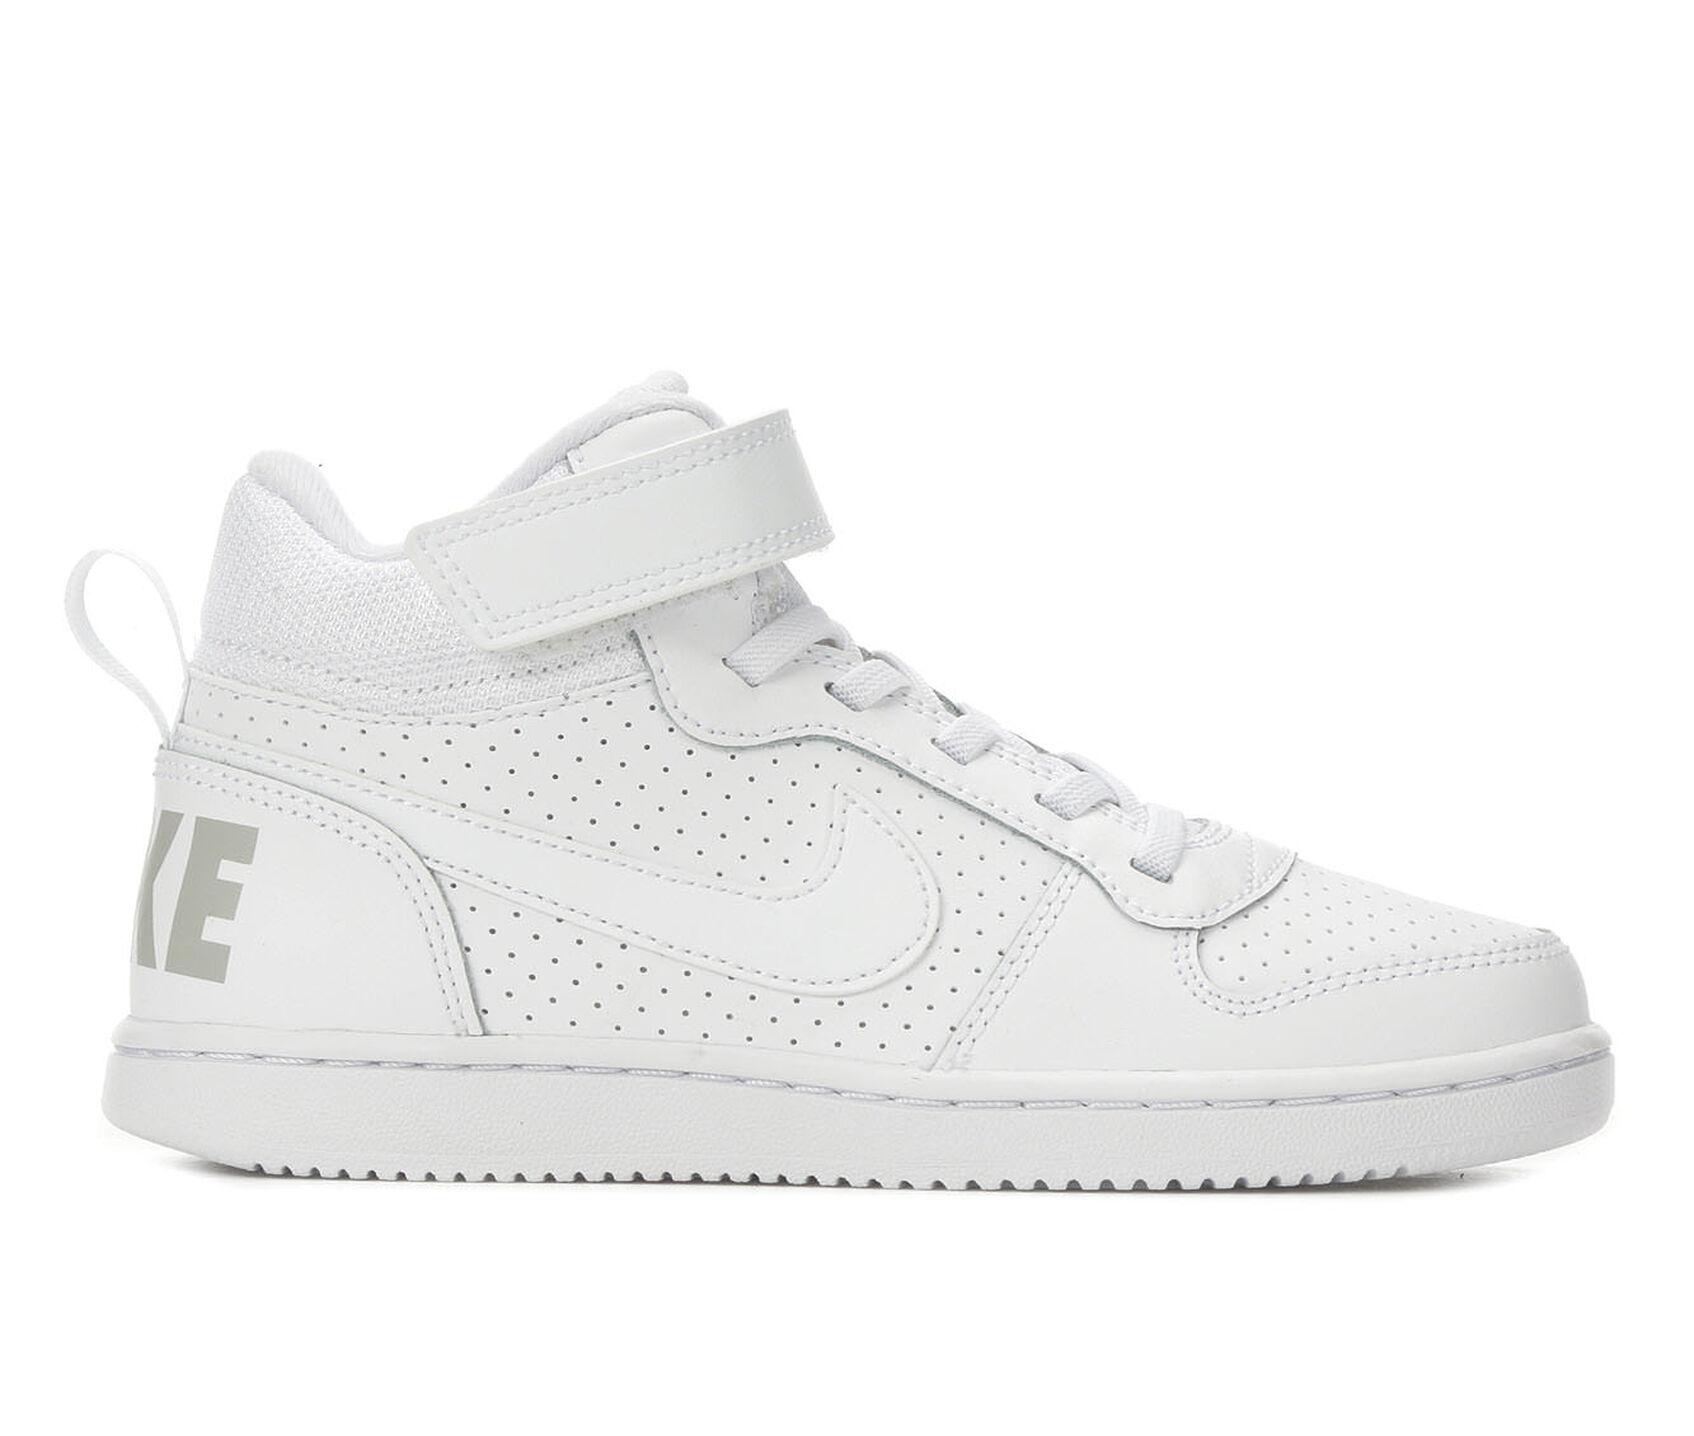 d42f11cbc4 Kids' Nike Little Kid Court Borough Mid Velcro High Top Basketball Shoes